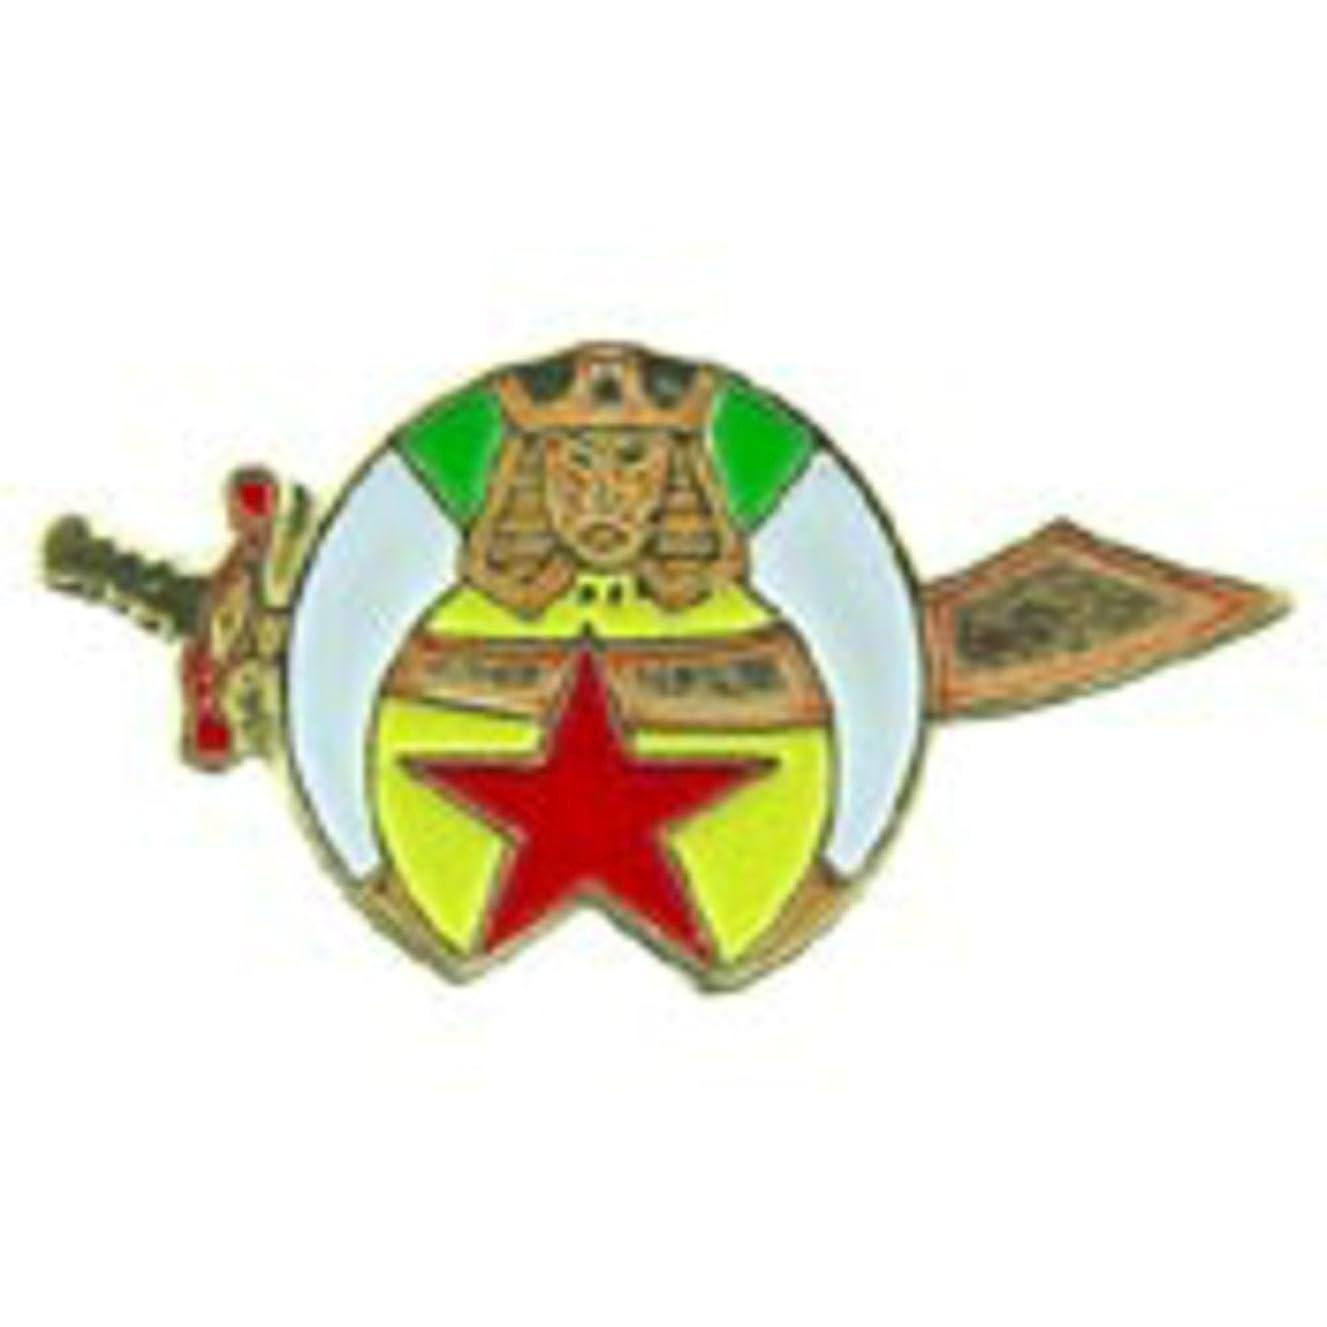 EagleEmblems P60659 PIN-ORG,Shriner,Emblem (1'')